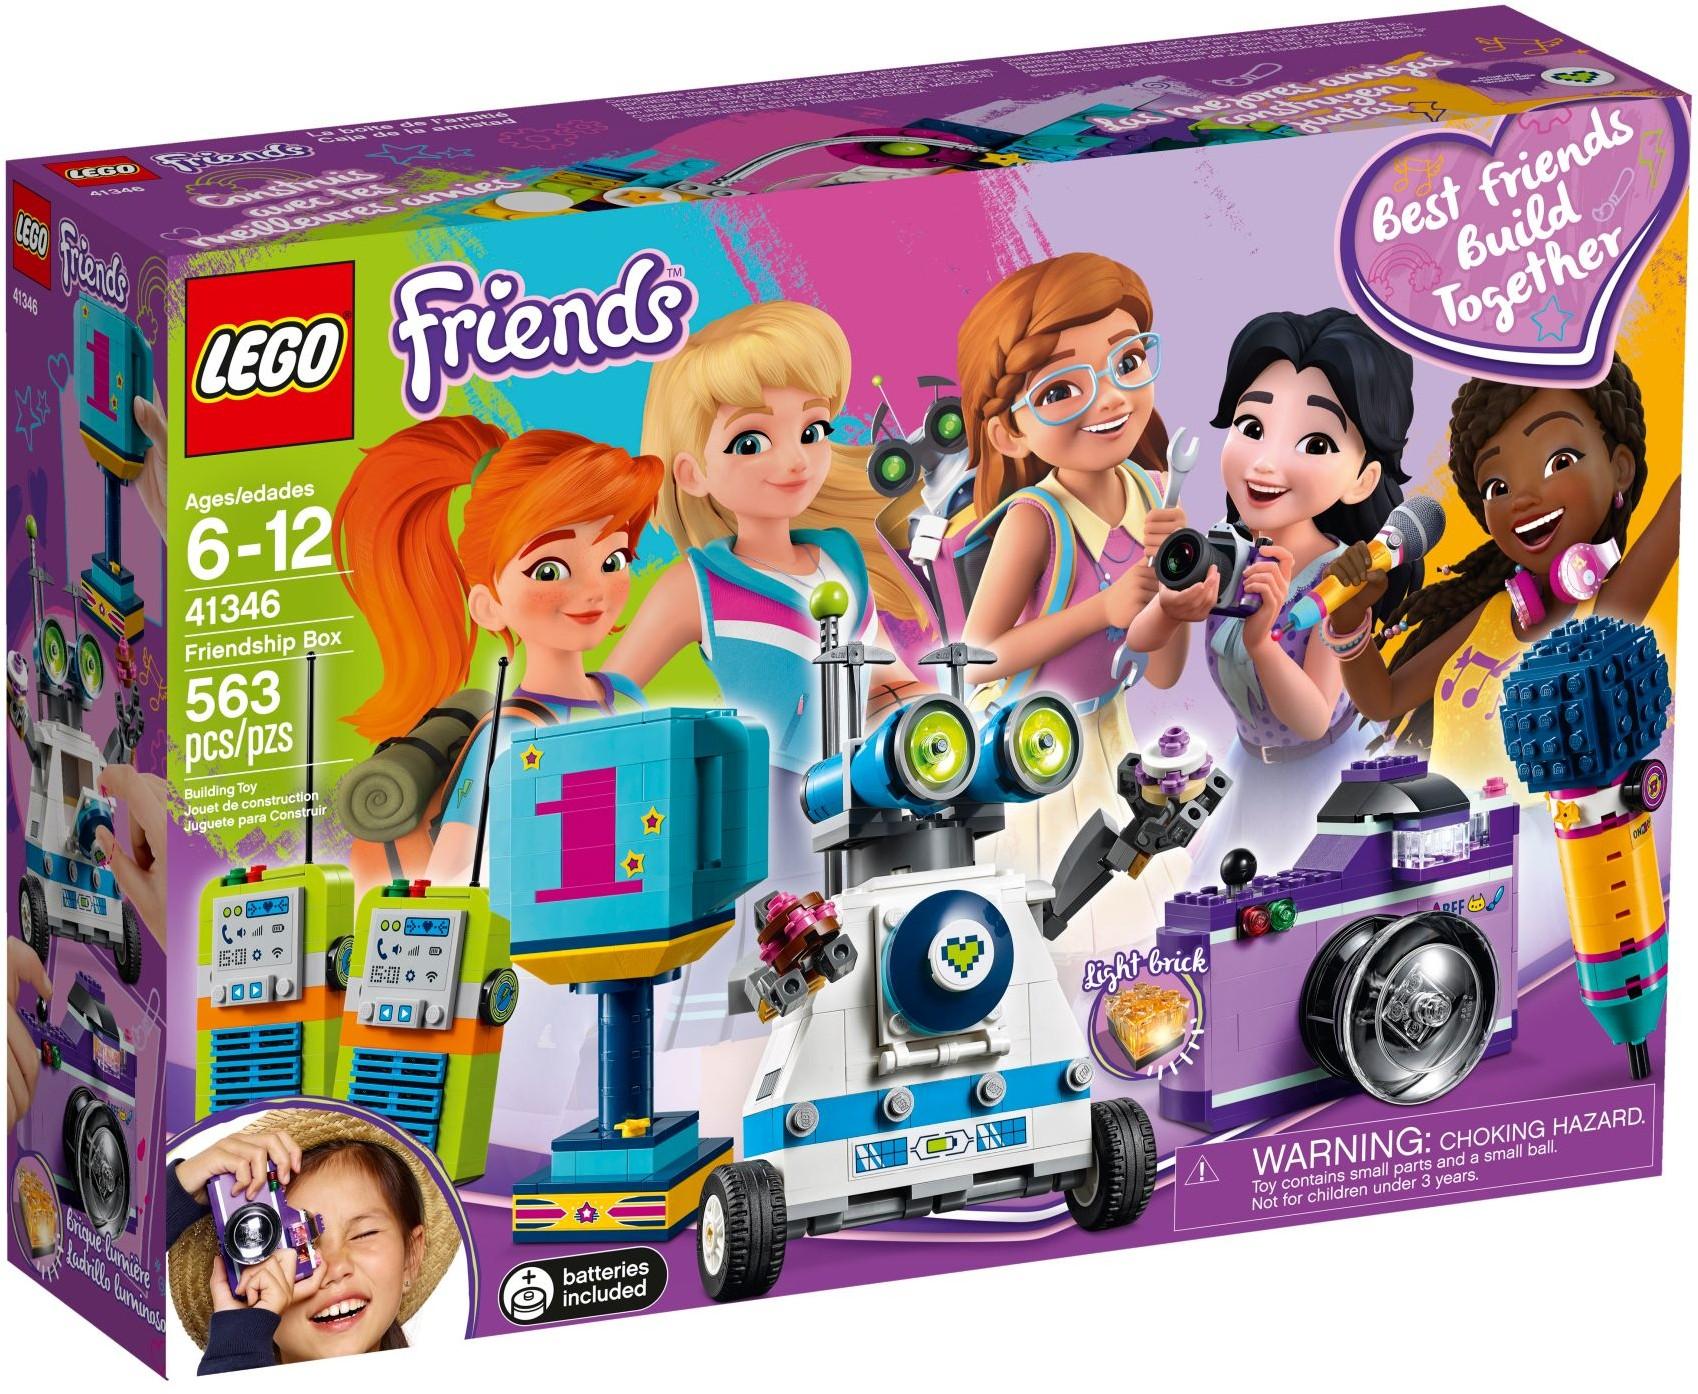 41346 Friendship Box